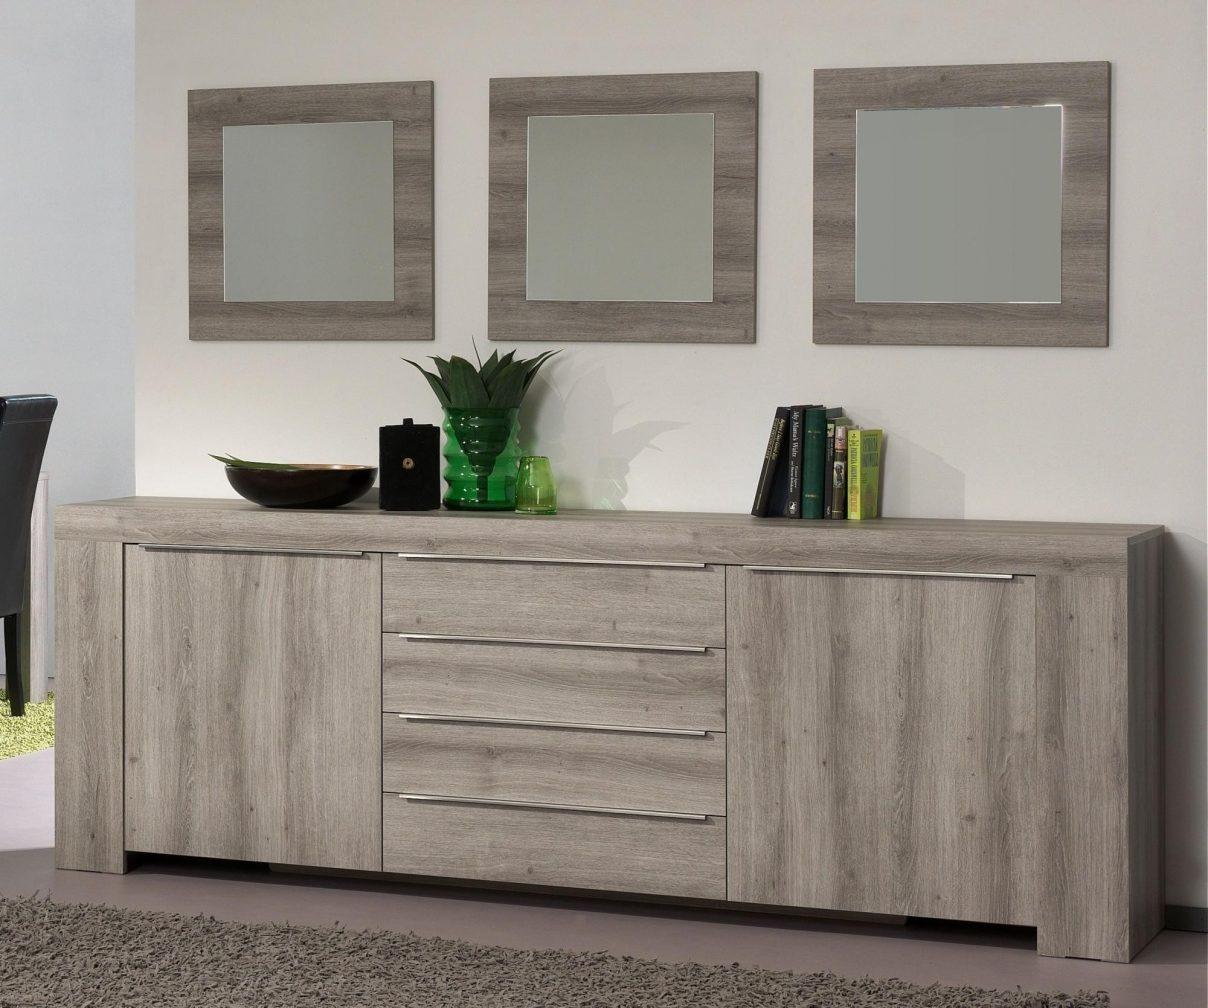 Design Meuble Salon Blanc Conforama